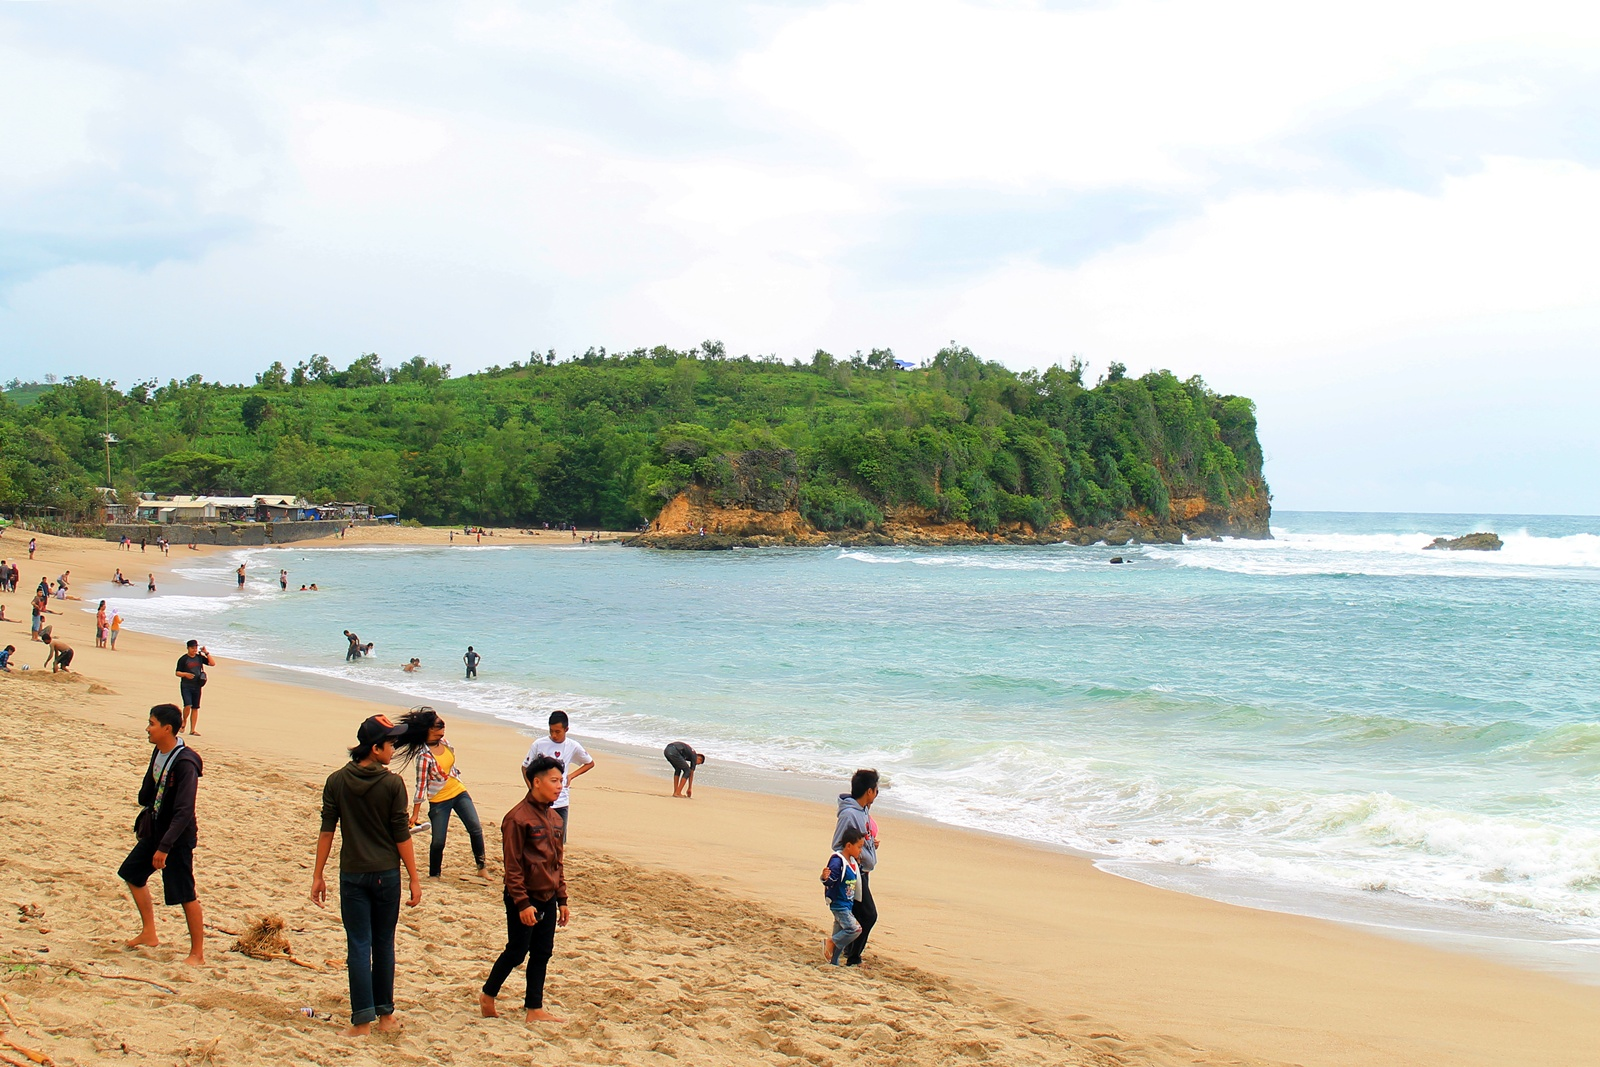 11 Pantai Indah Bisa Kamu Jelajahi Blitar Yuk Piknik Featured